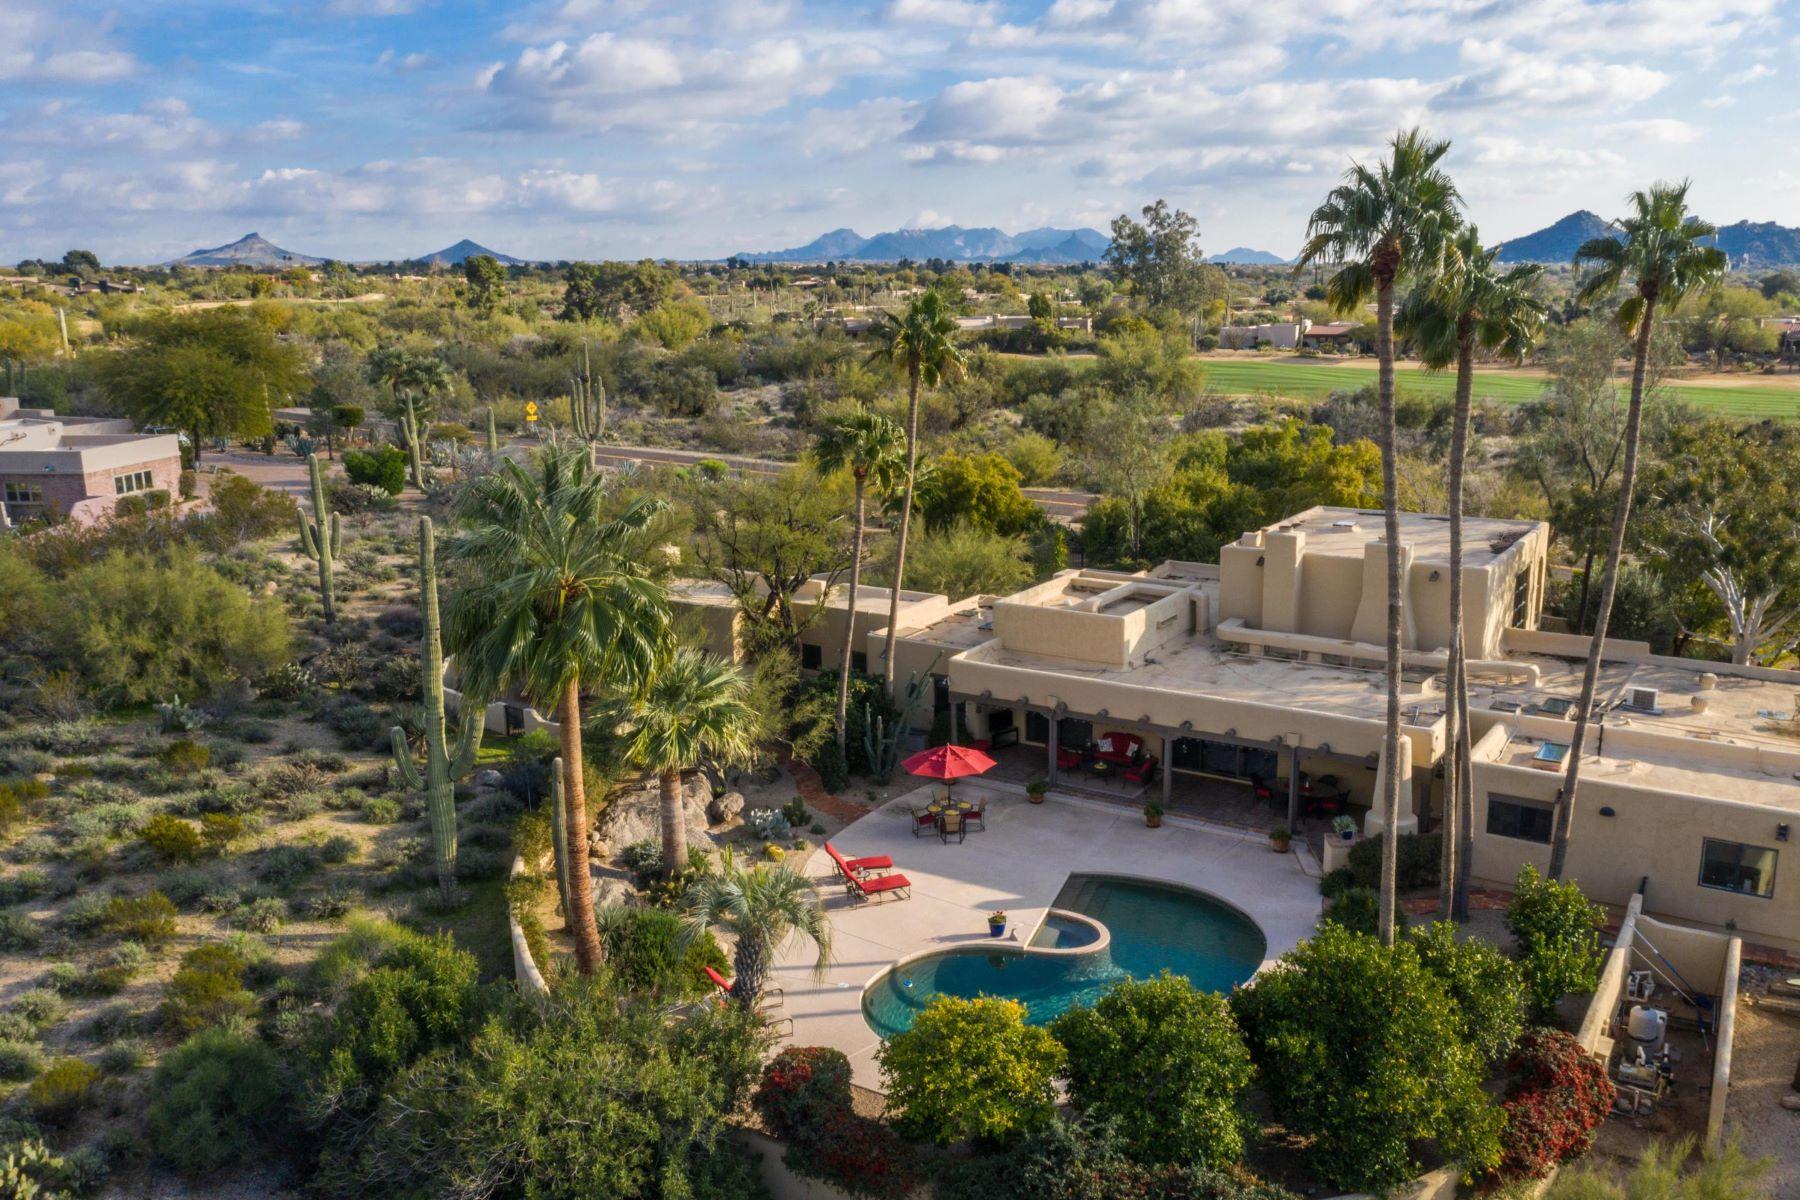 Single Family Homes for Active at Carefree Arizona 7446 E Stagecoach Pass RD Carefree, Arizona 85377 United States